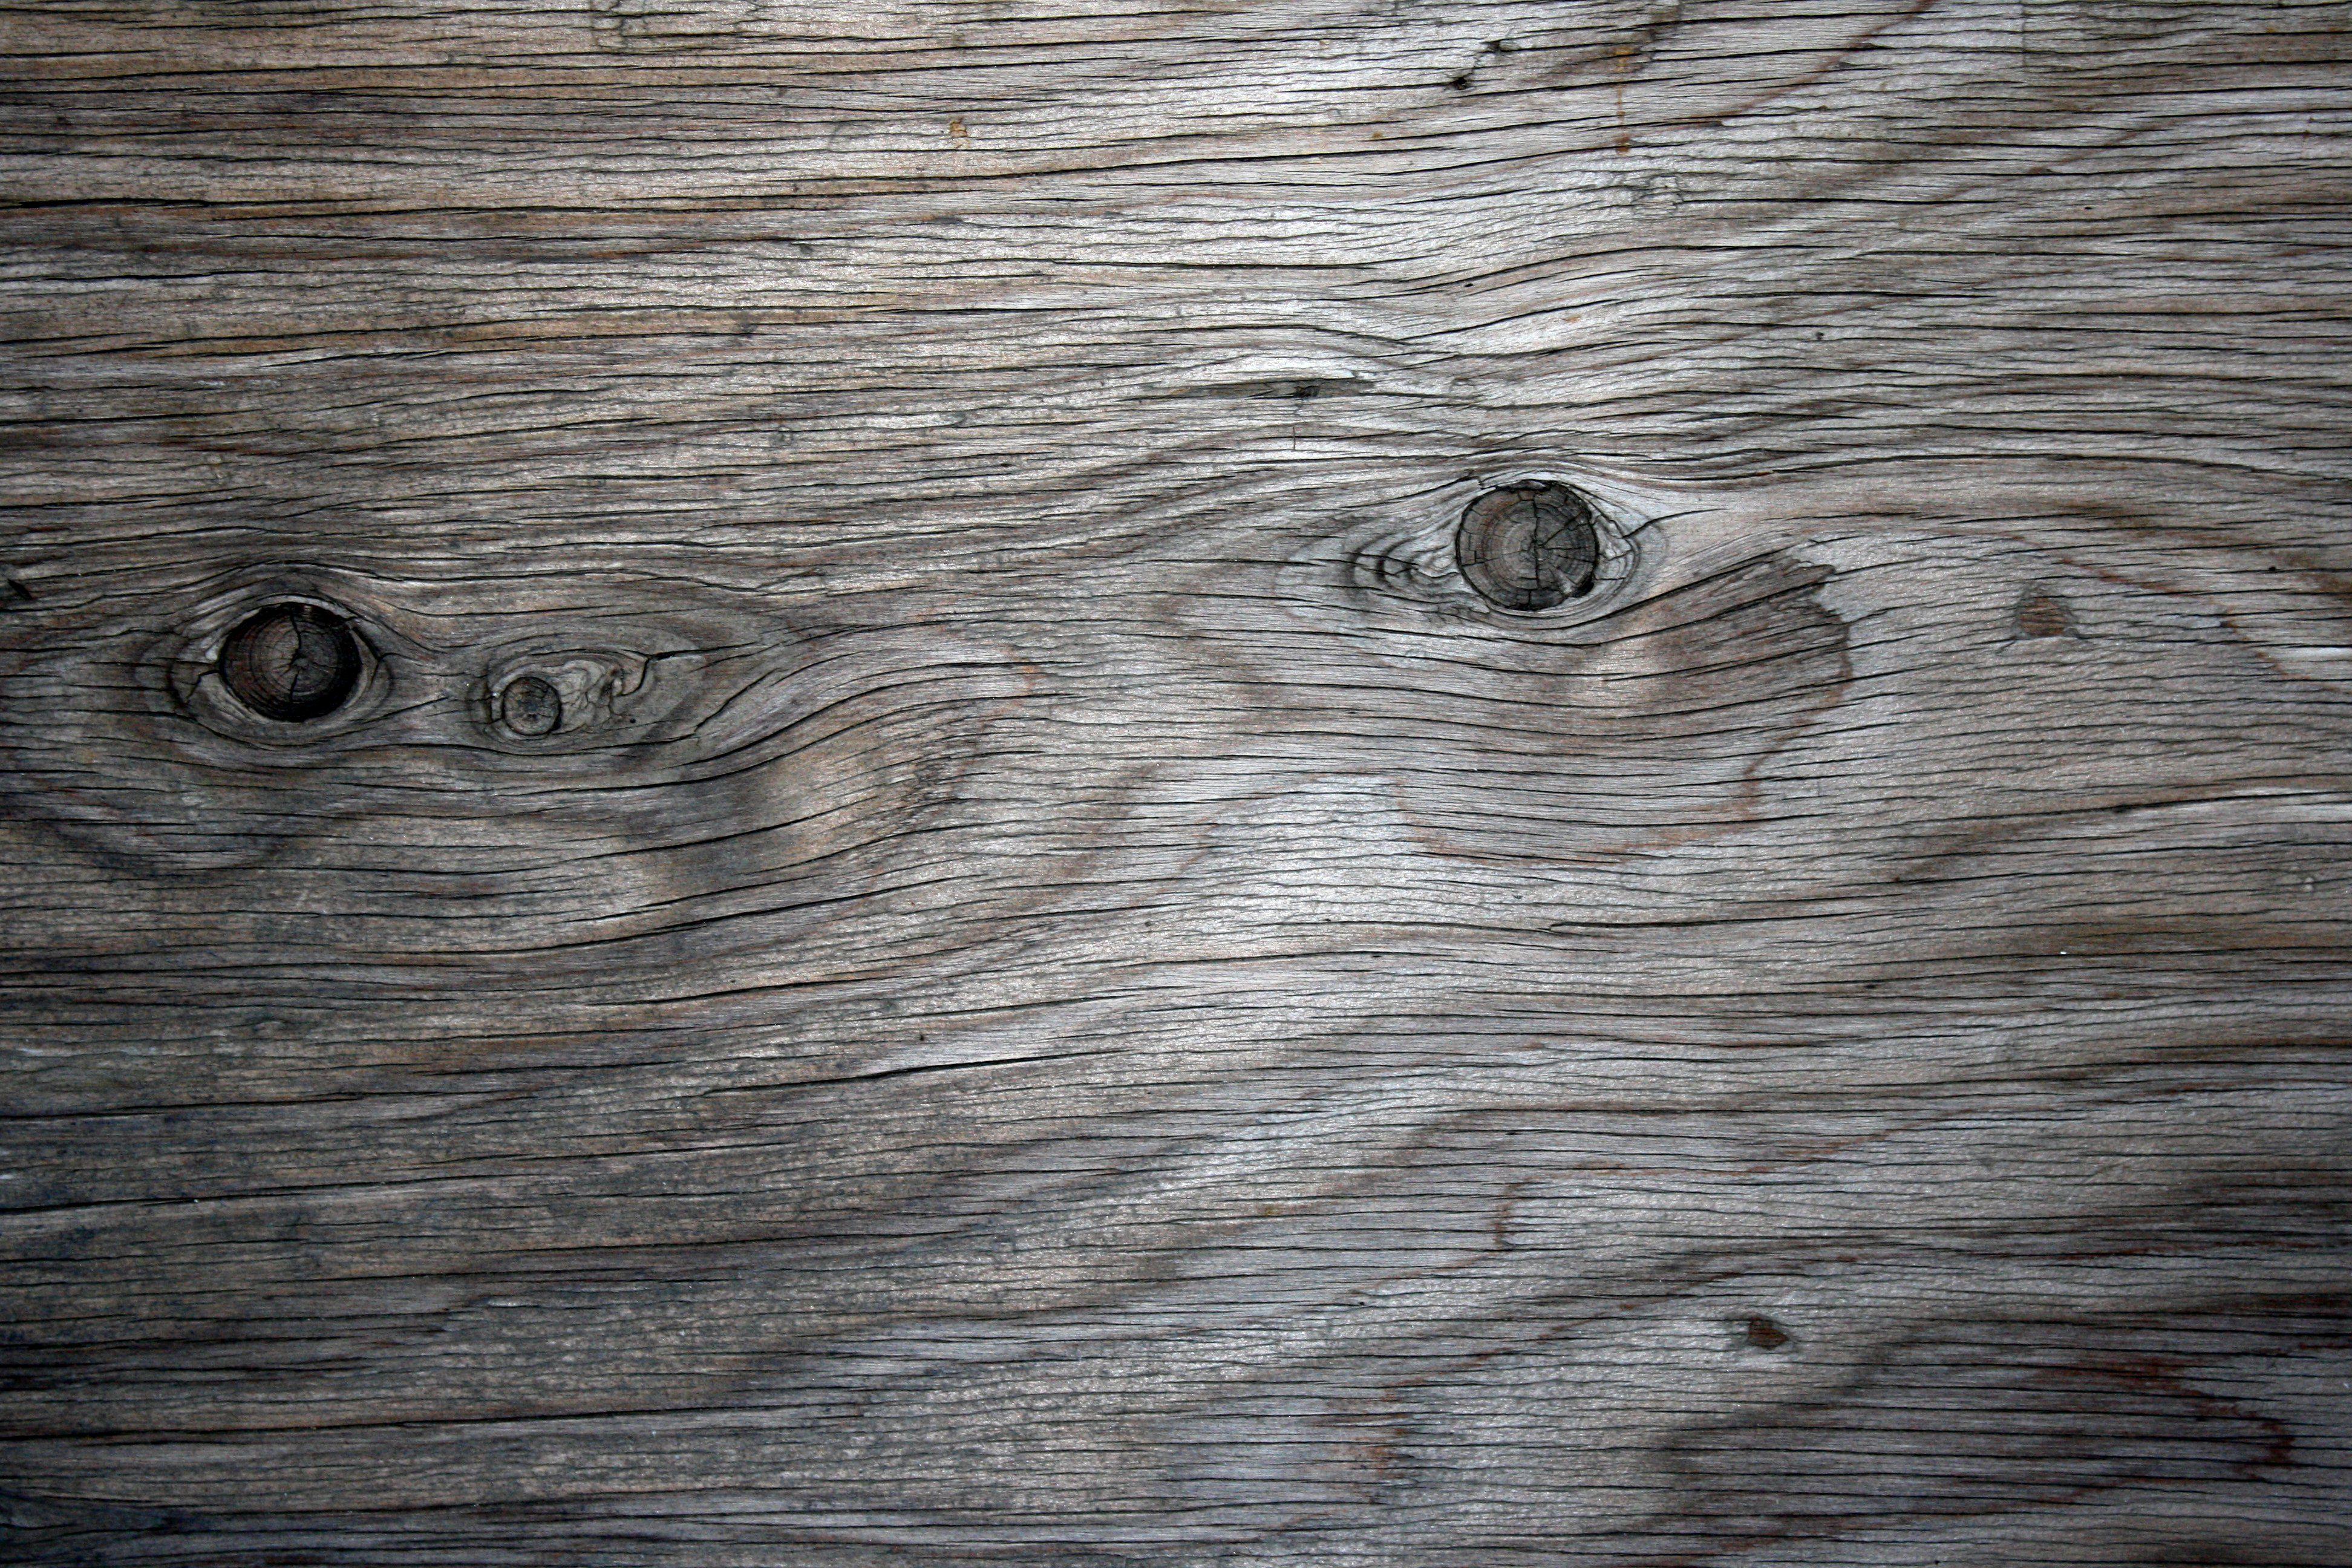 wood grain texture. Weathered Wood Grain Texture - Free High Resolution Photo T